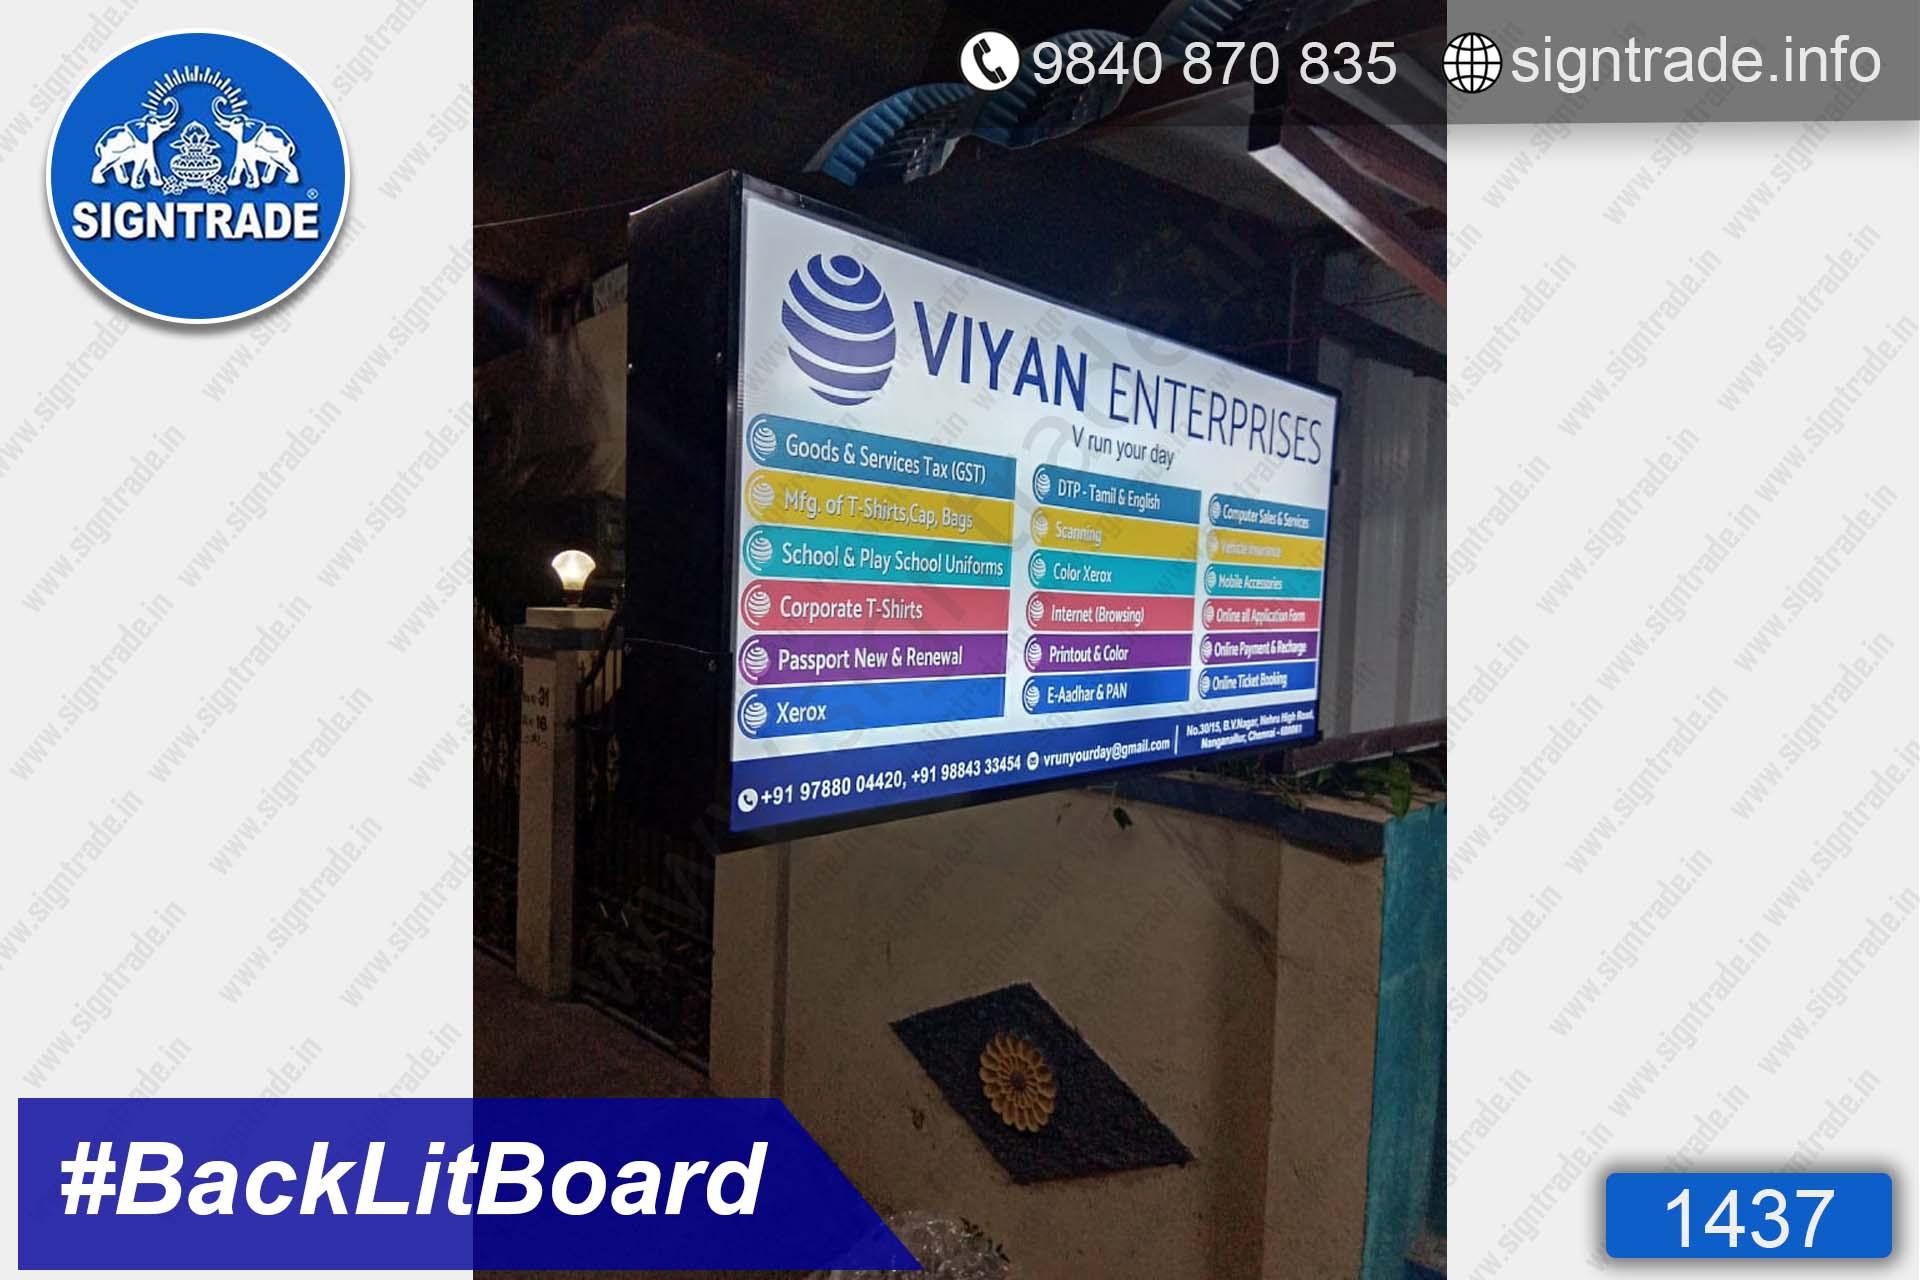 Viyan Enterprises - 1437, Flex Board, Frontlit Flex Board, Star Frontlit Flex Board, Frontlit Flex Banners, Shop Front Flex Board, Shop Flex Board, Star Flex